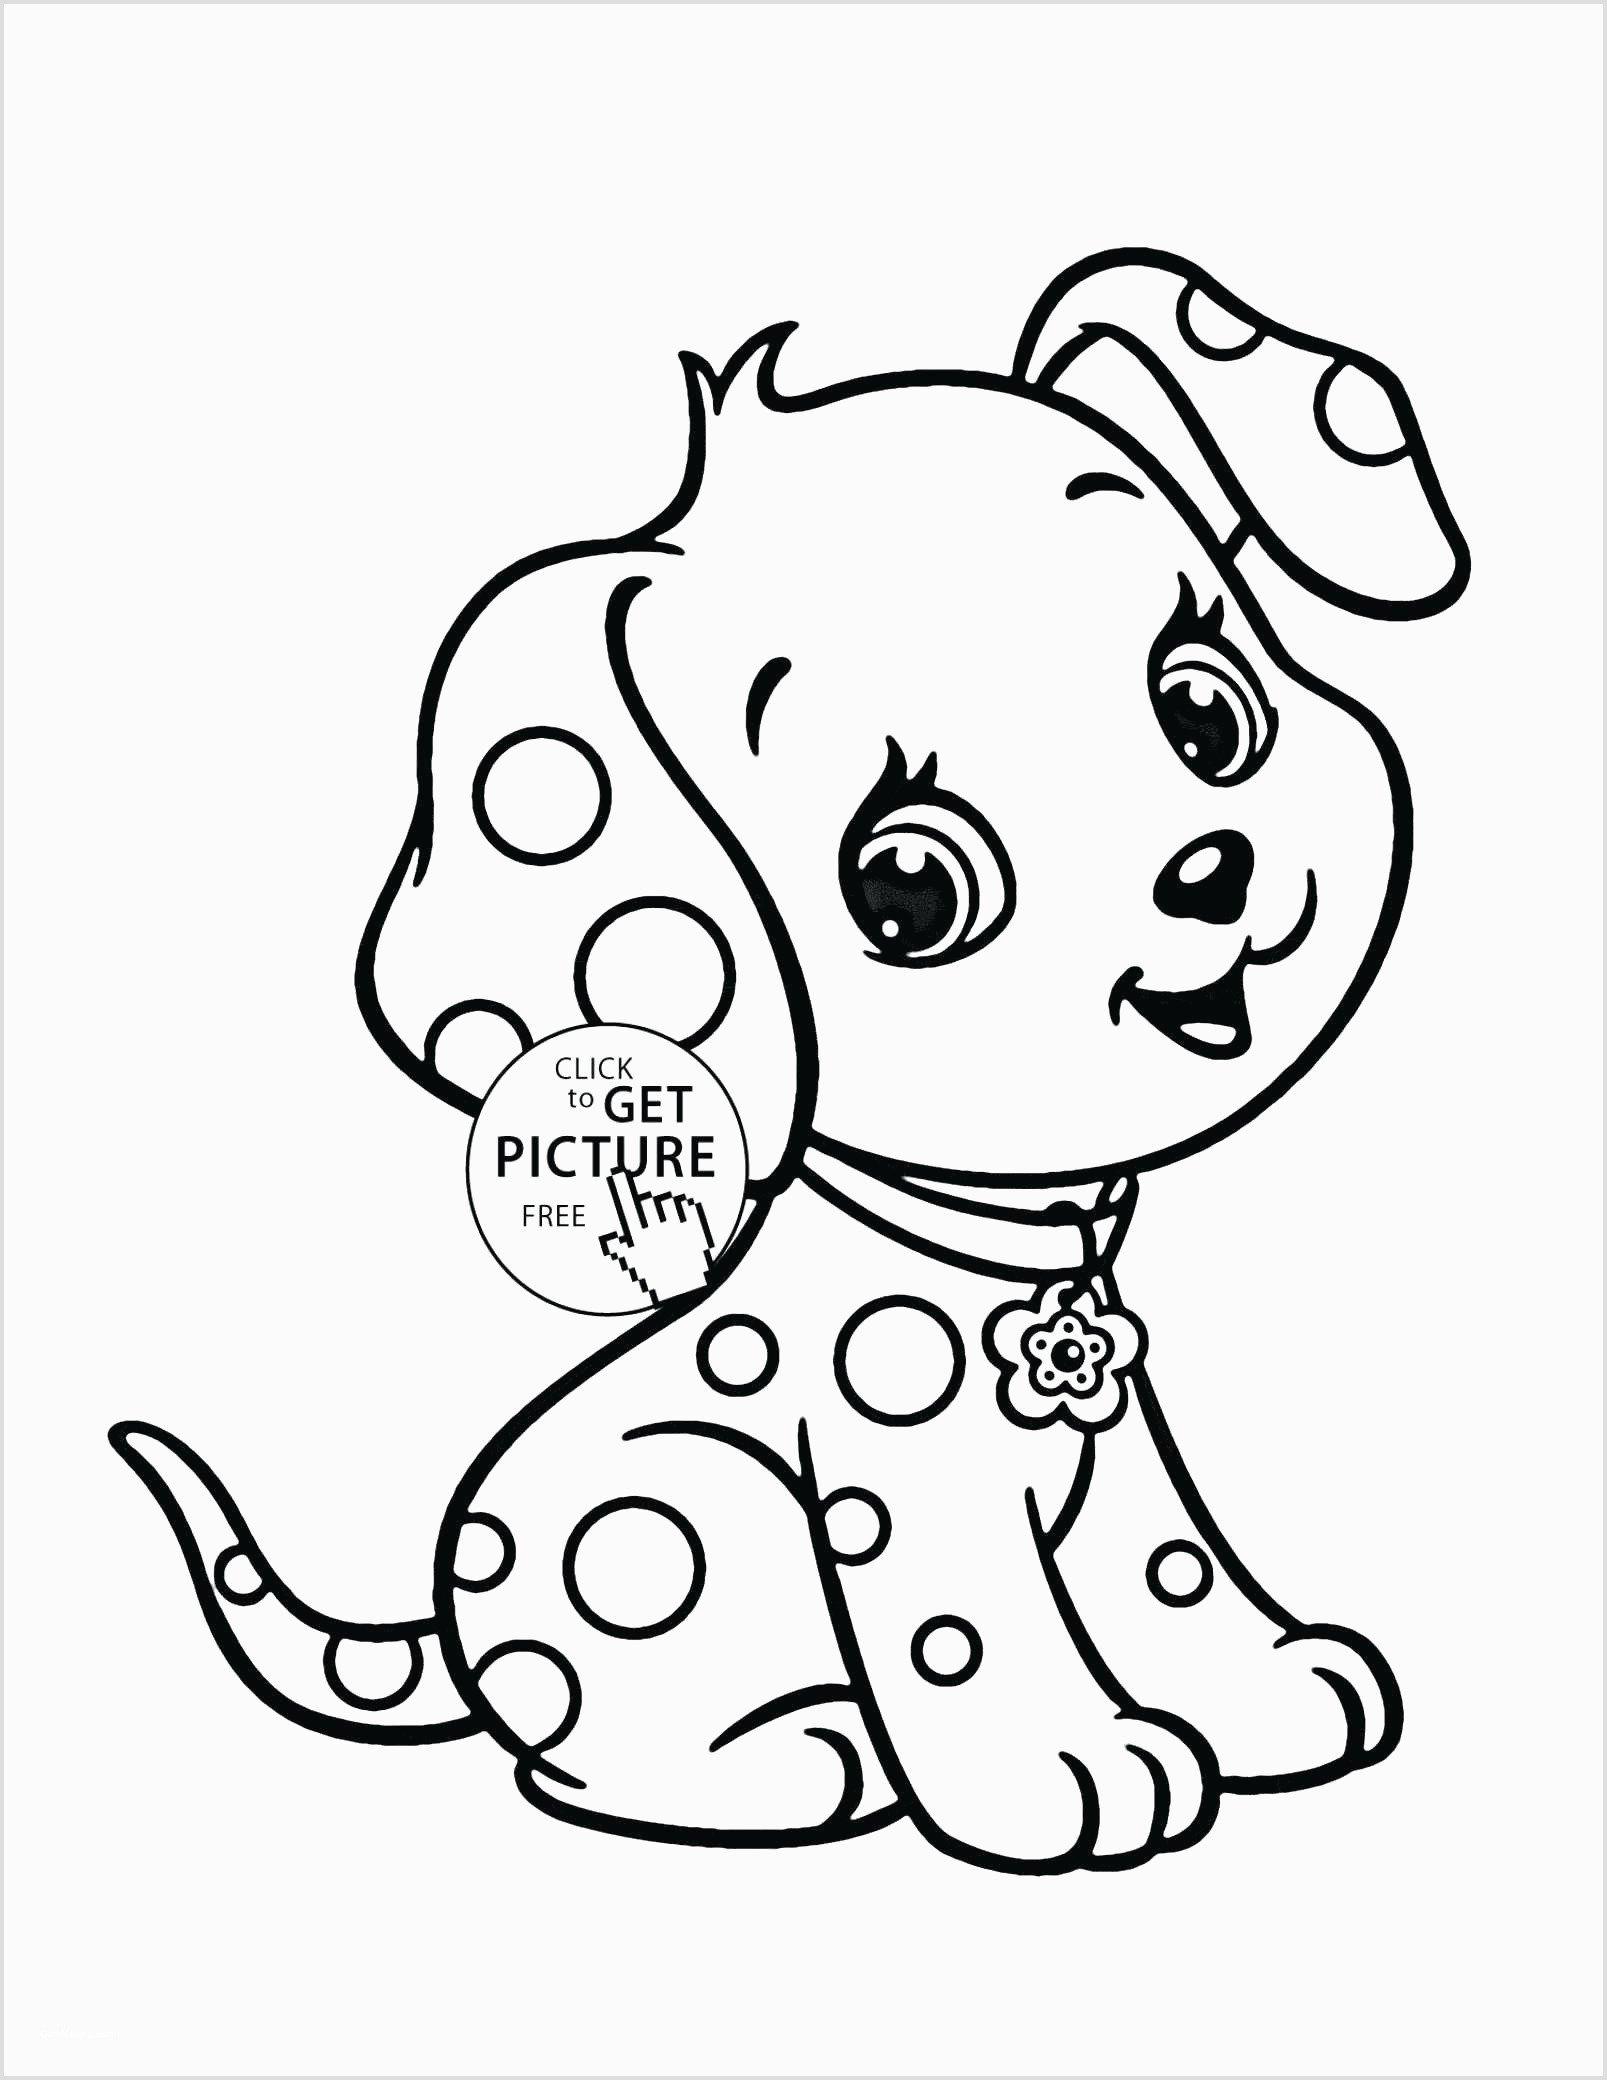 Colour Worksheets for Preschoolers Inspirational Coloring Free Halloween Best Cursive Alphabet Worksheets